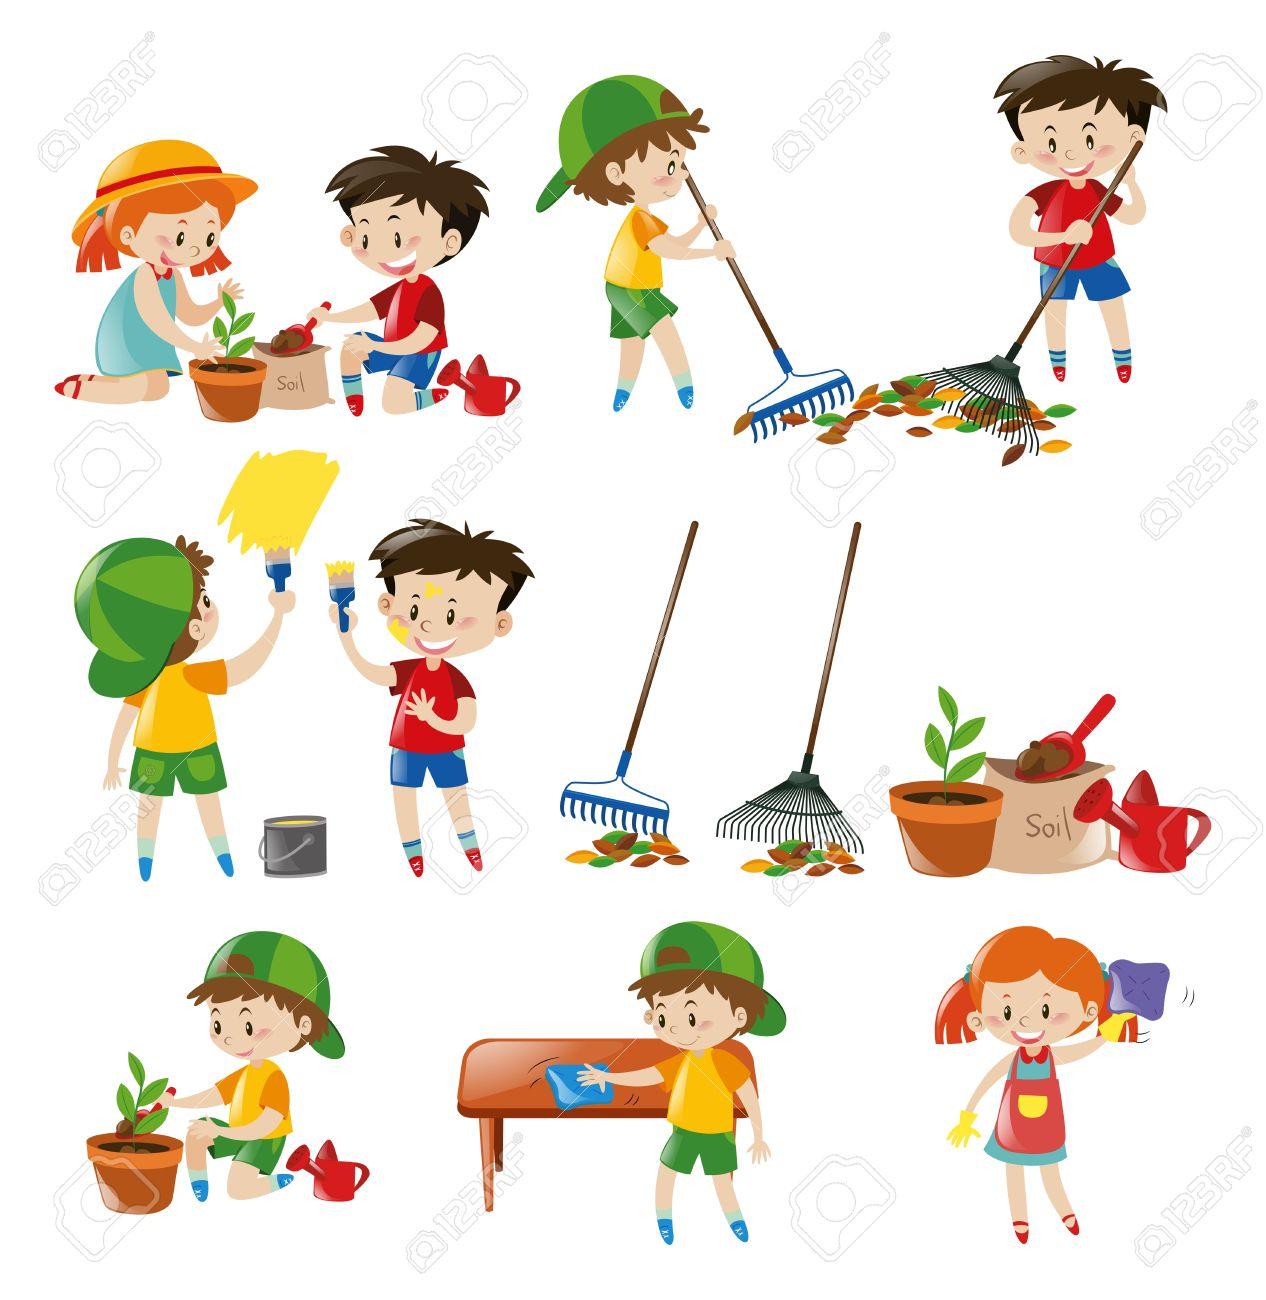 hight resolution of children doing different chores illustration stock vector 63490607